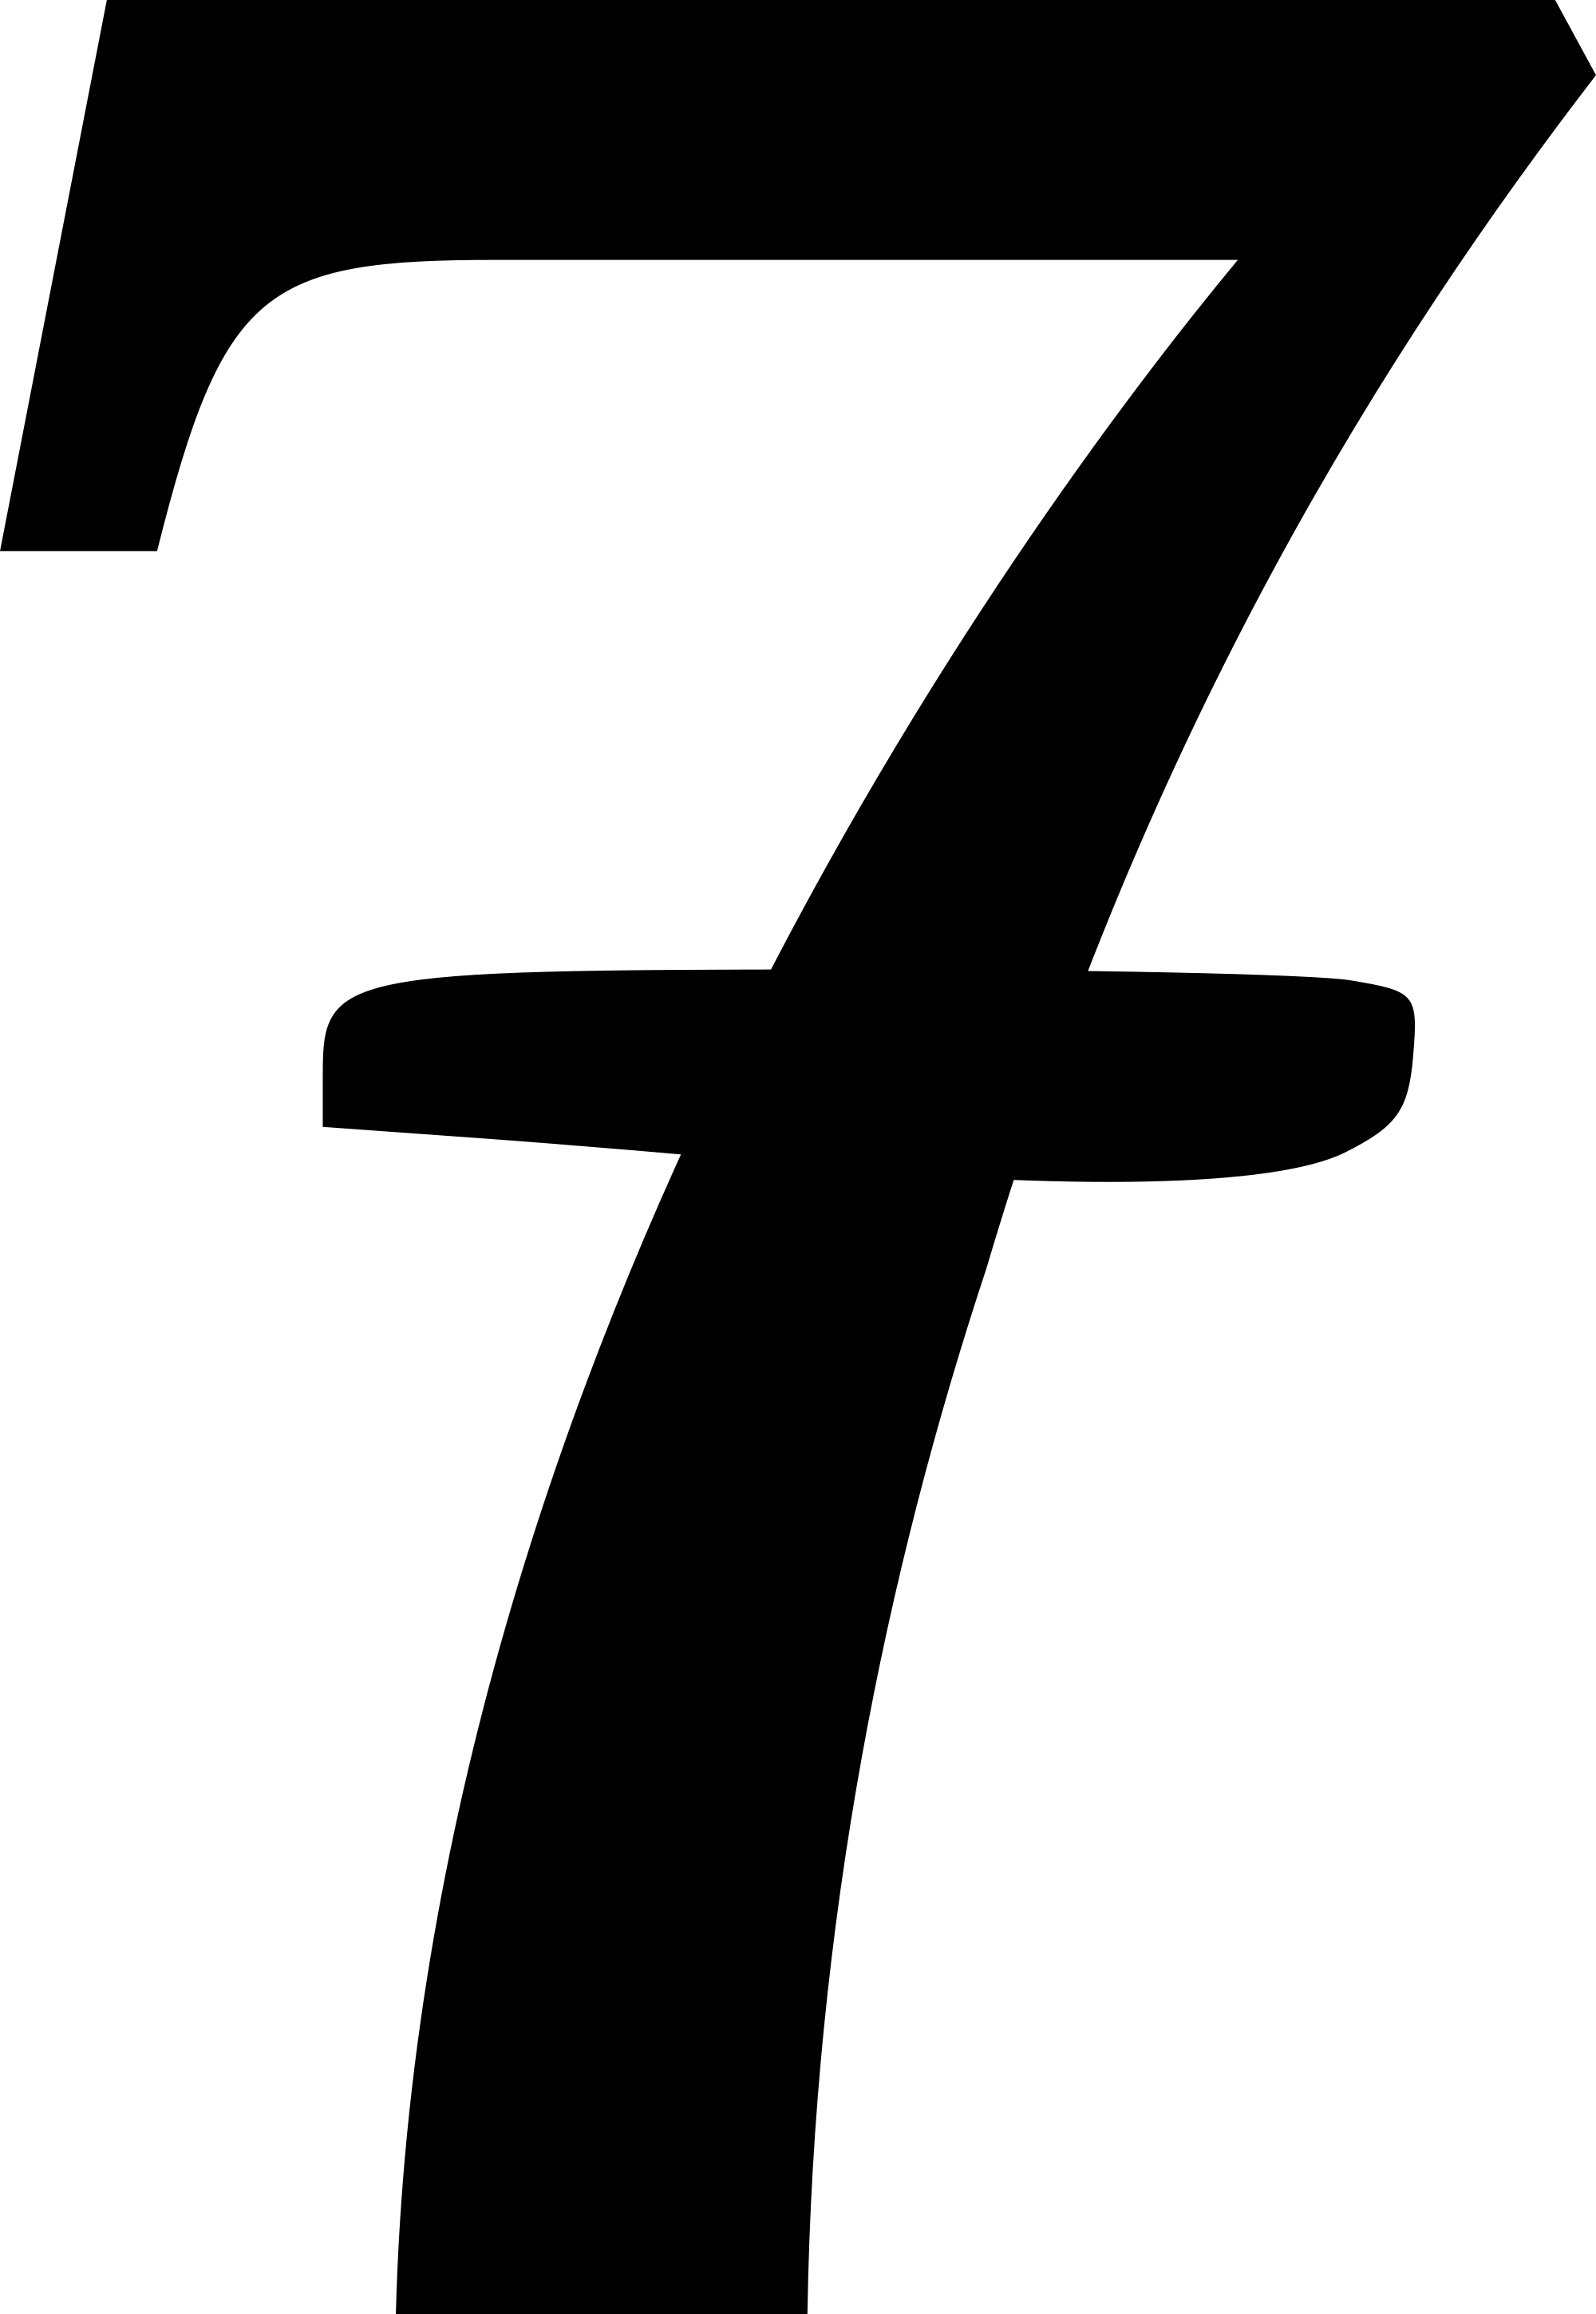 Regional handwriting variation